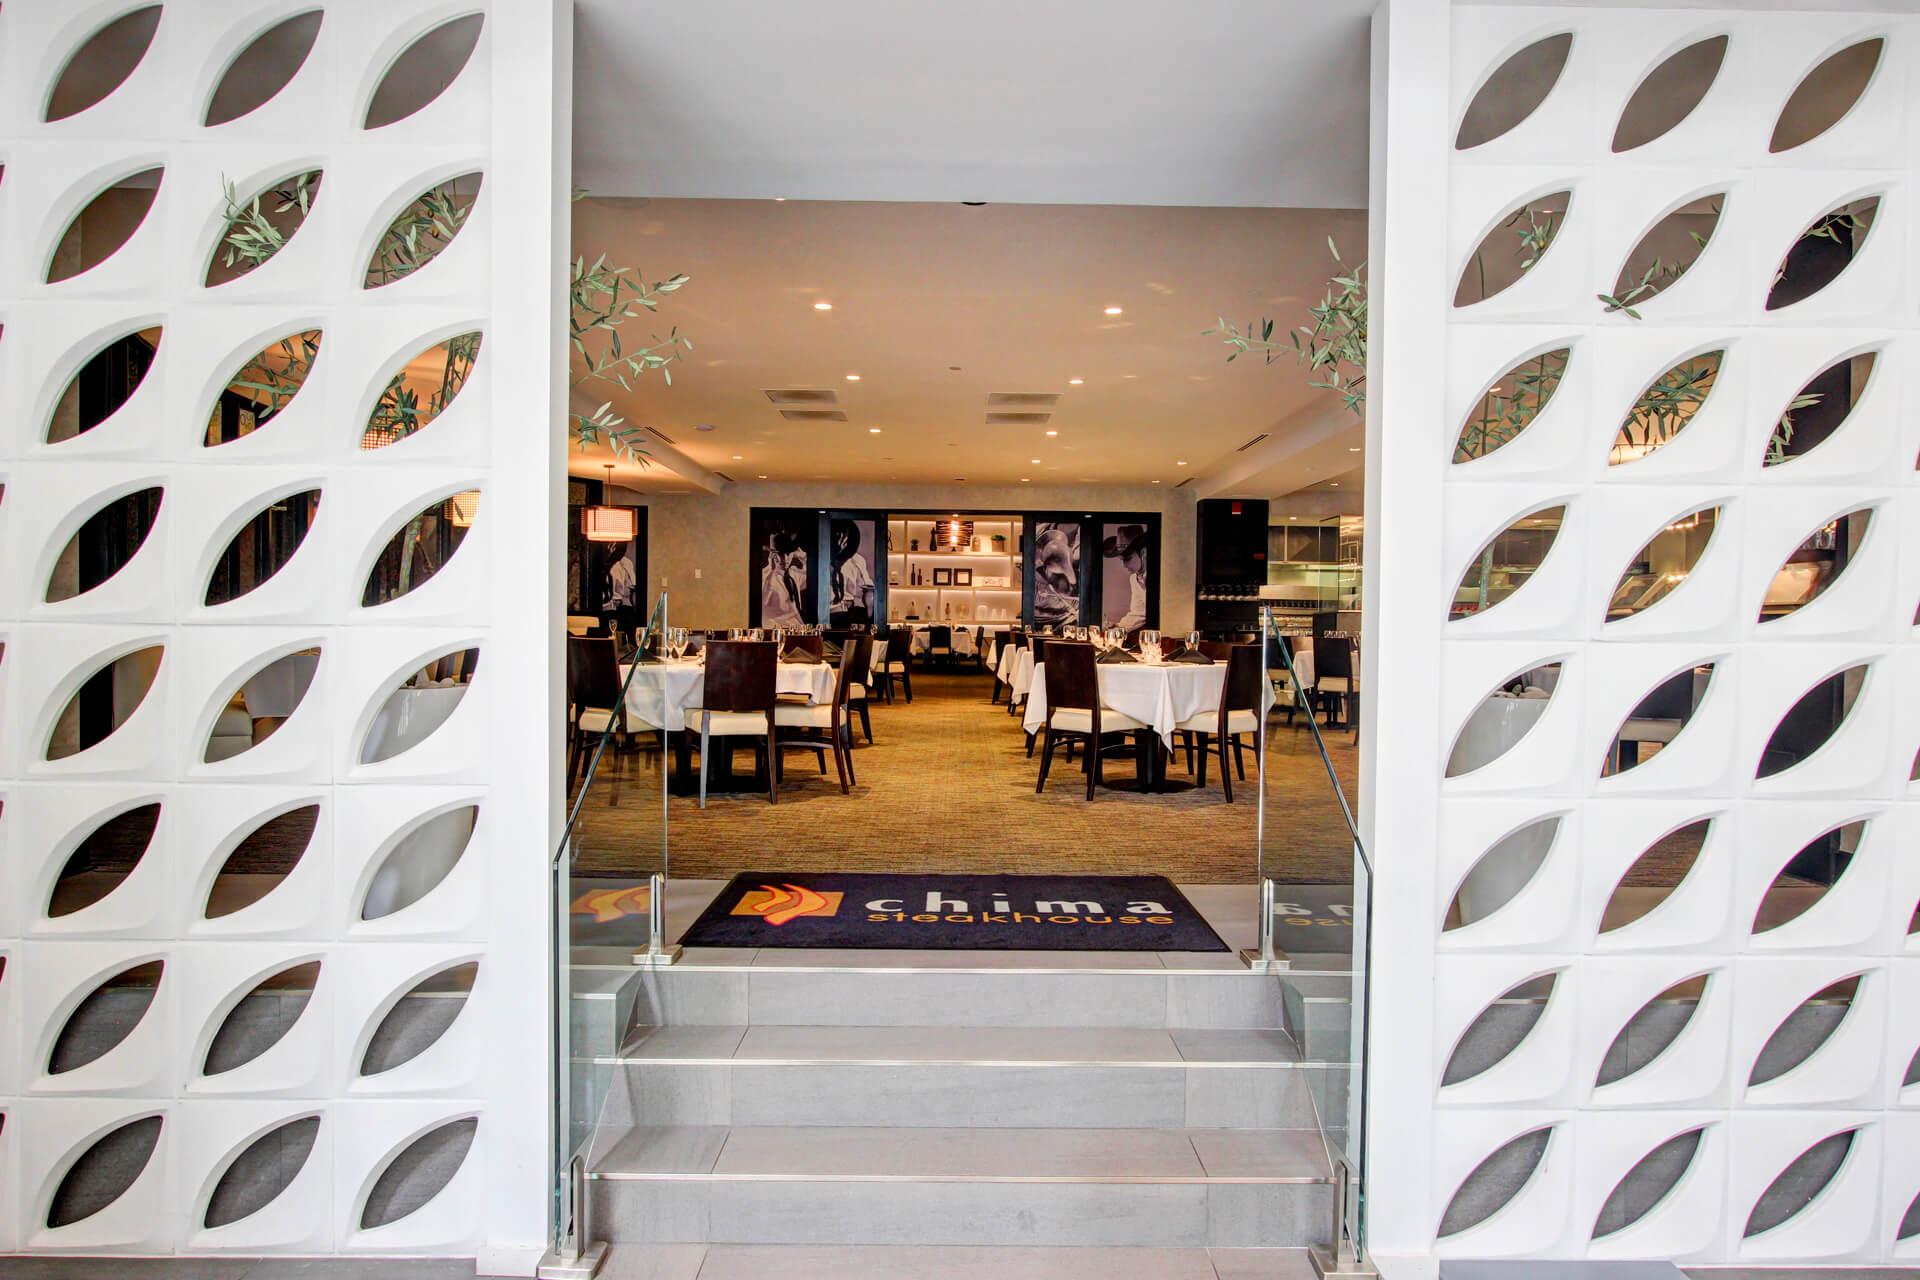 Chima Steakhouse is One of the Best Restaurants in Philadelphia